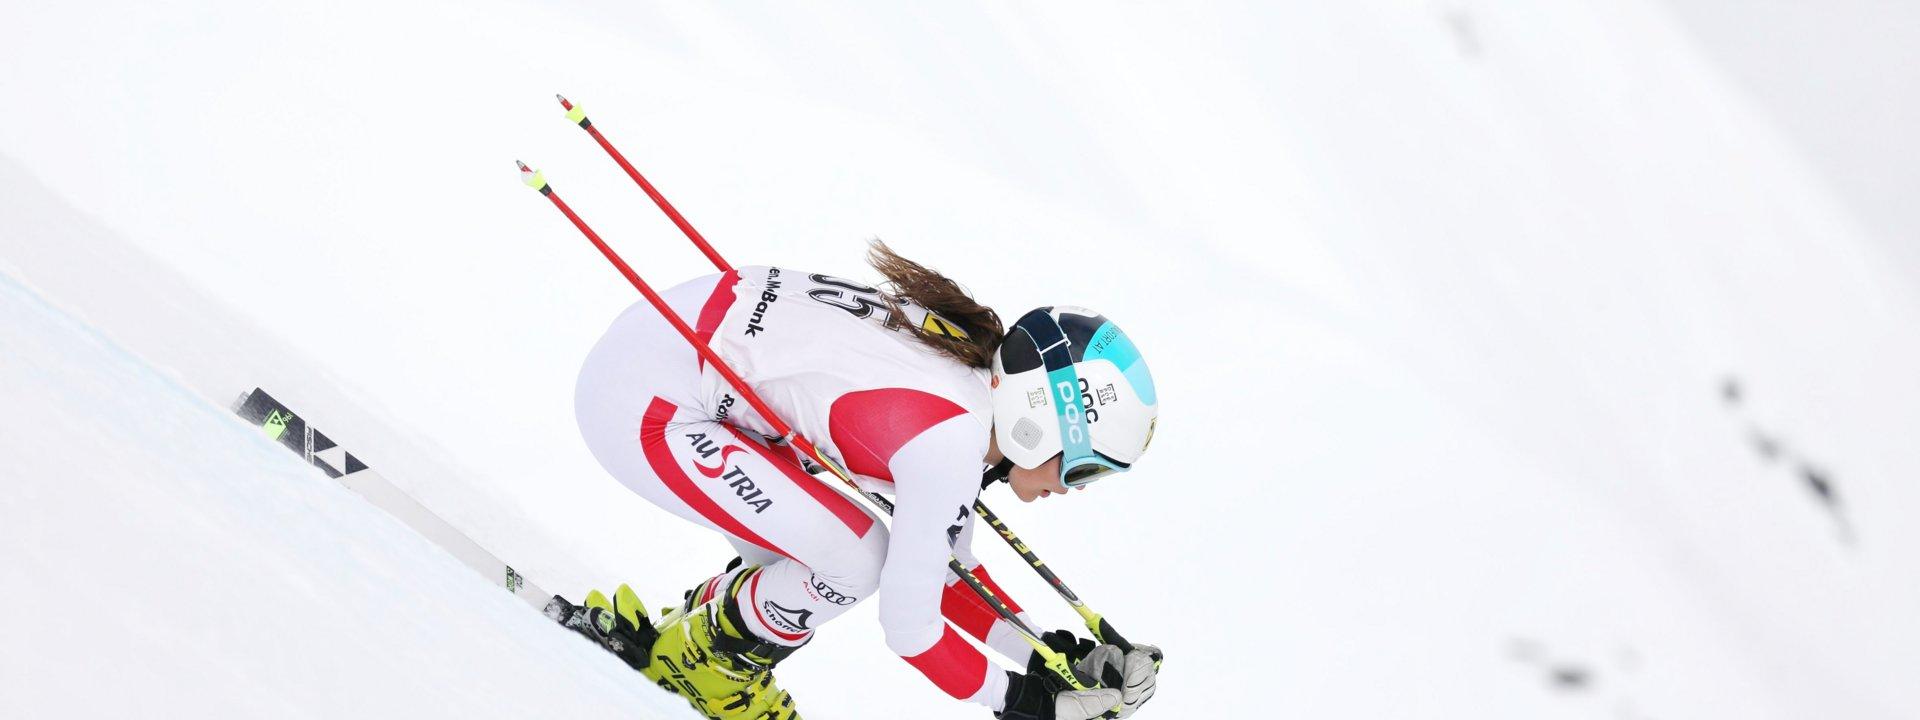 Lena Lamprecht